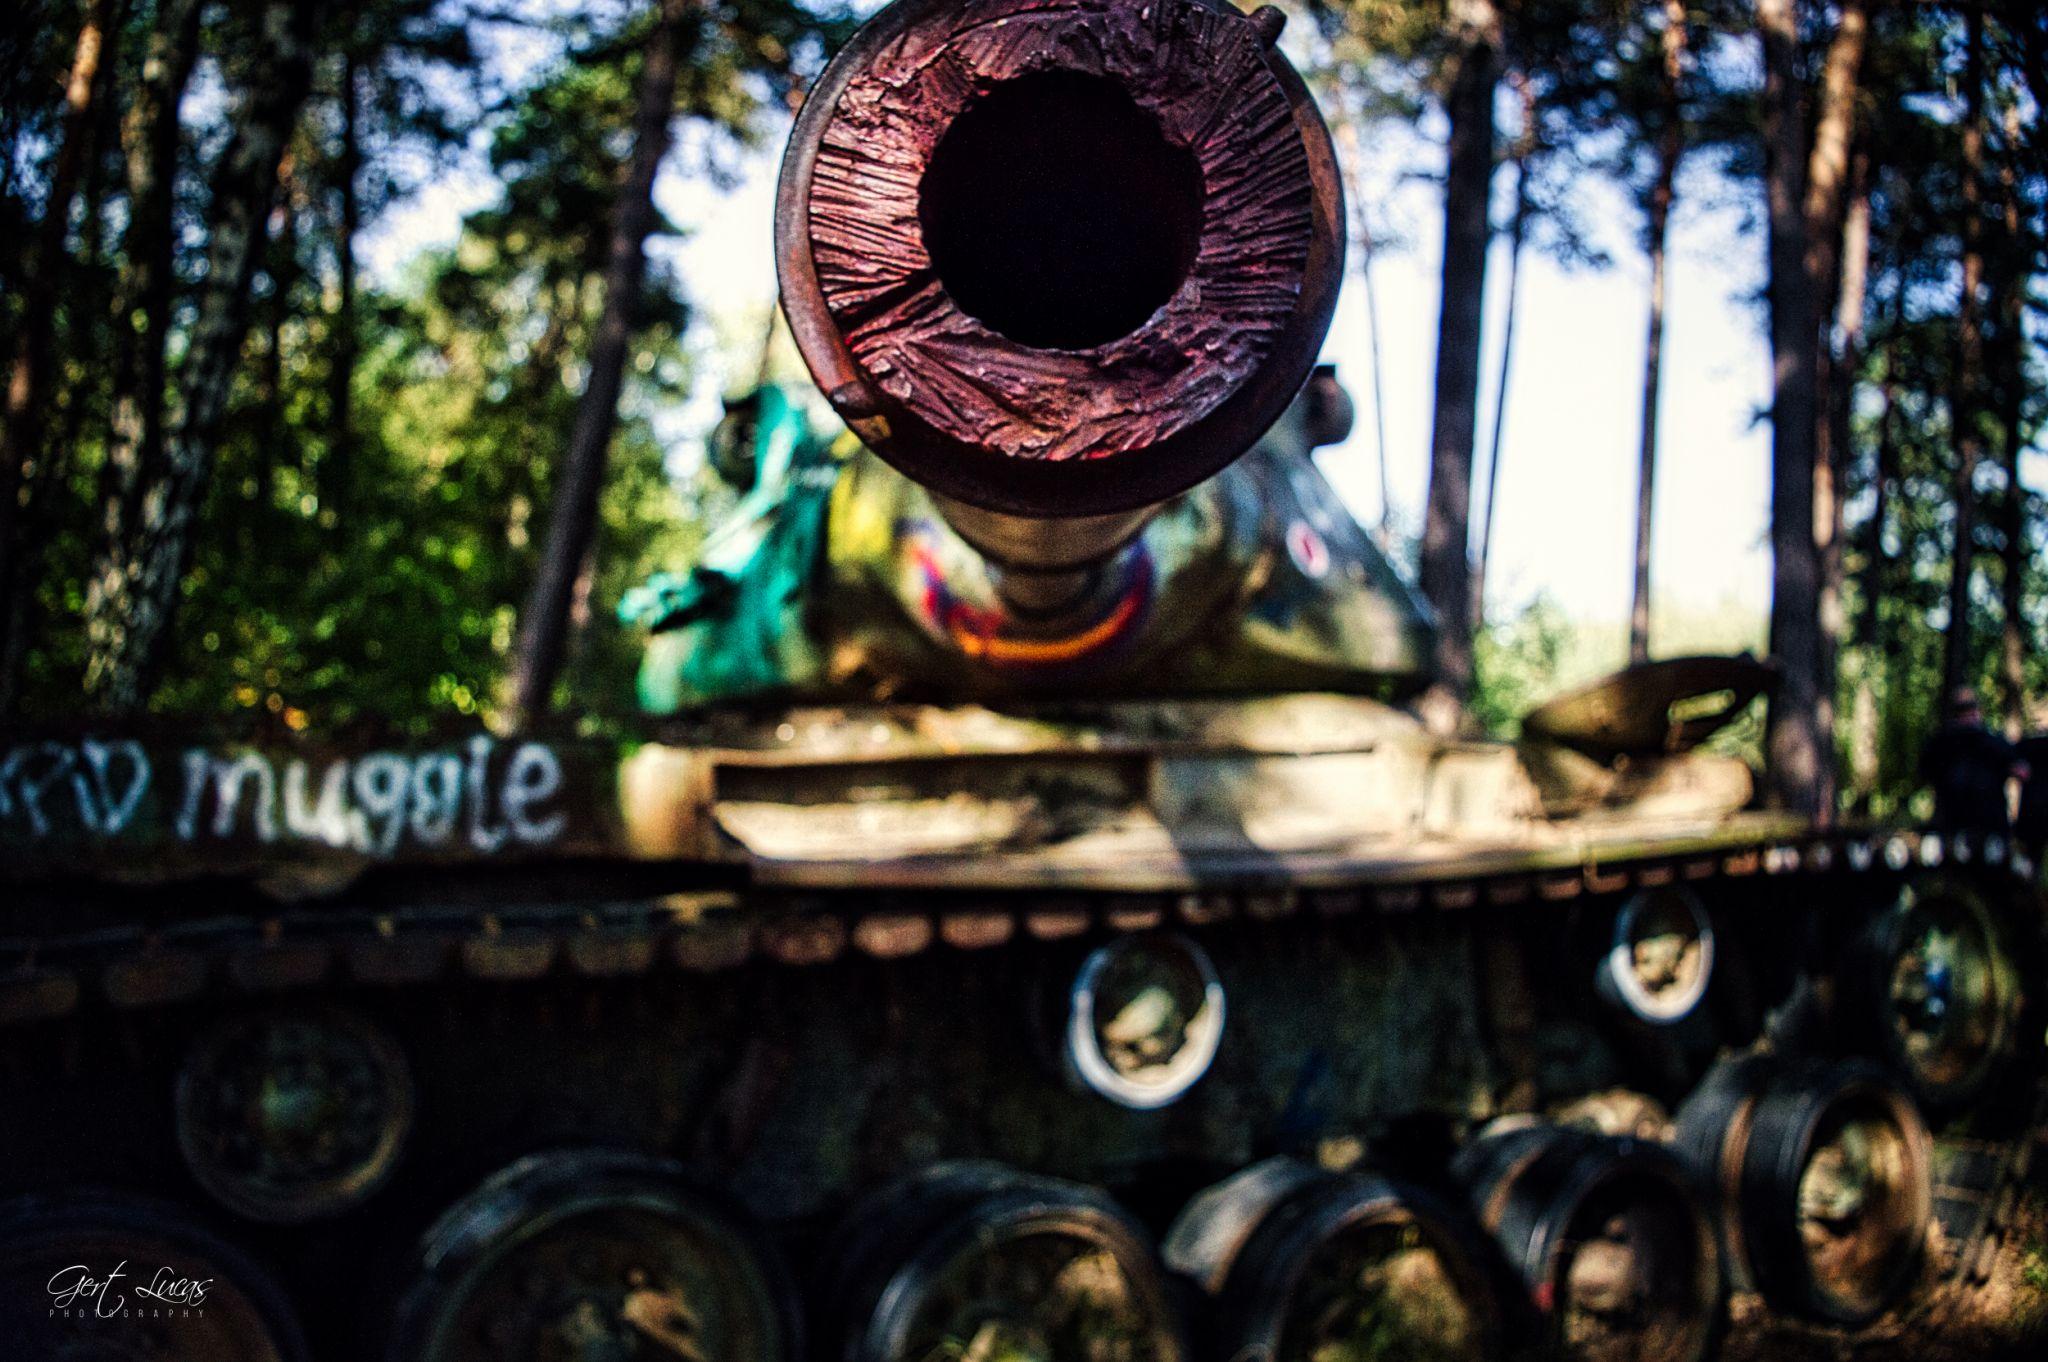 US Tank in Branderwald, Germany